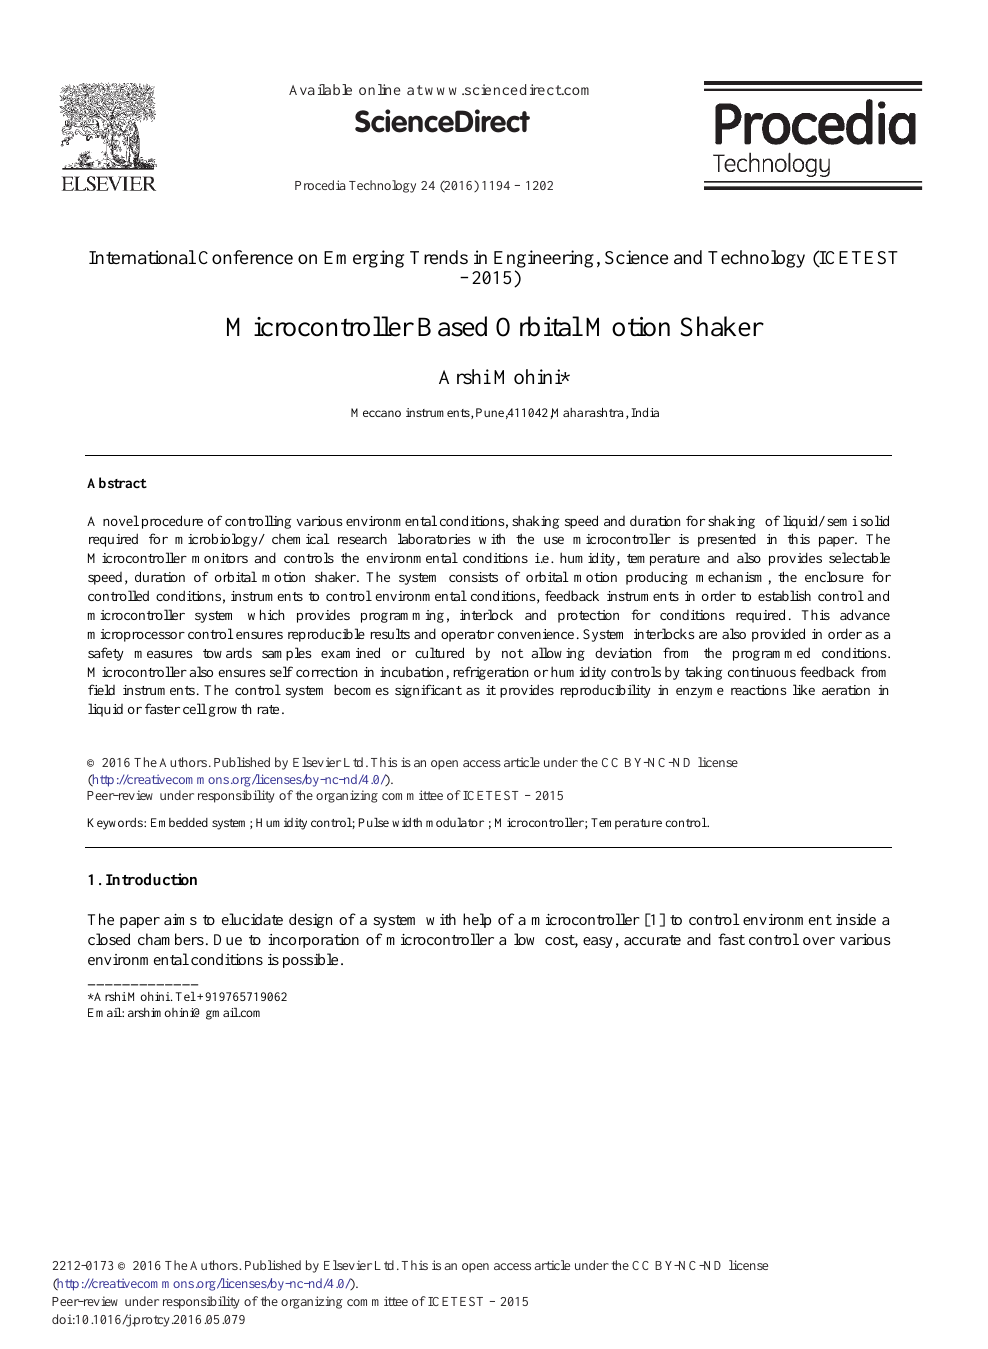 Microcontroller Based Orbital Motion Shaker – topic of